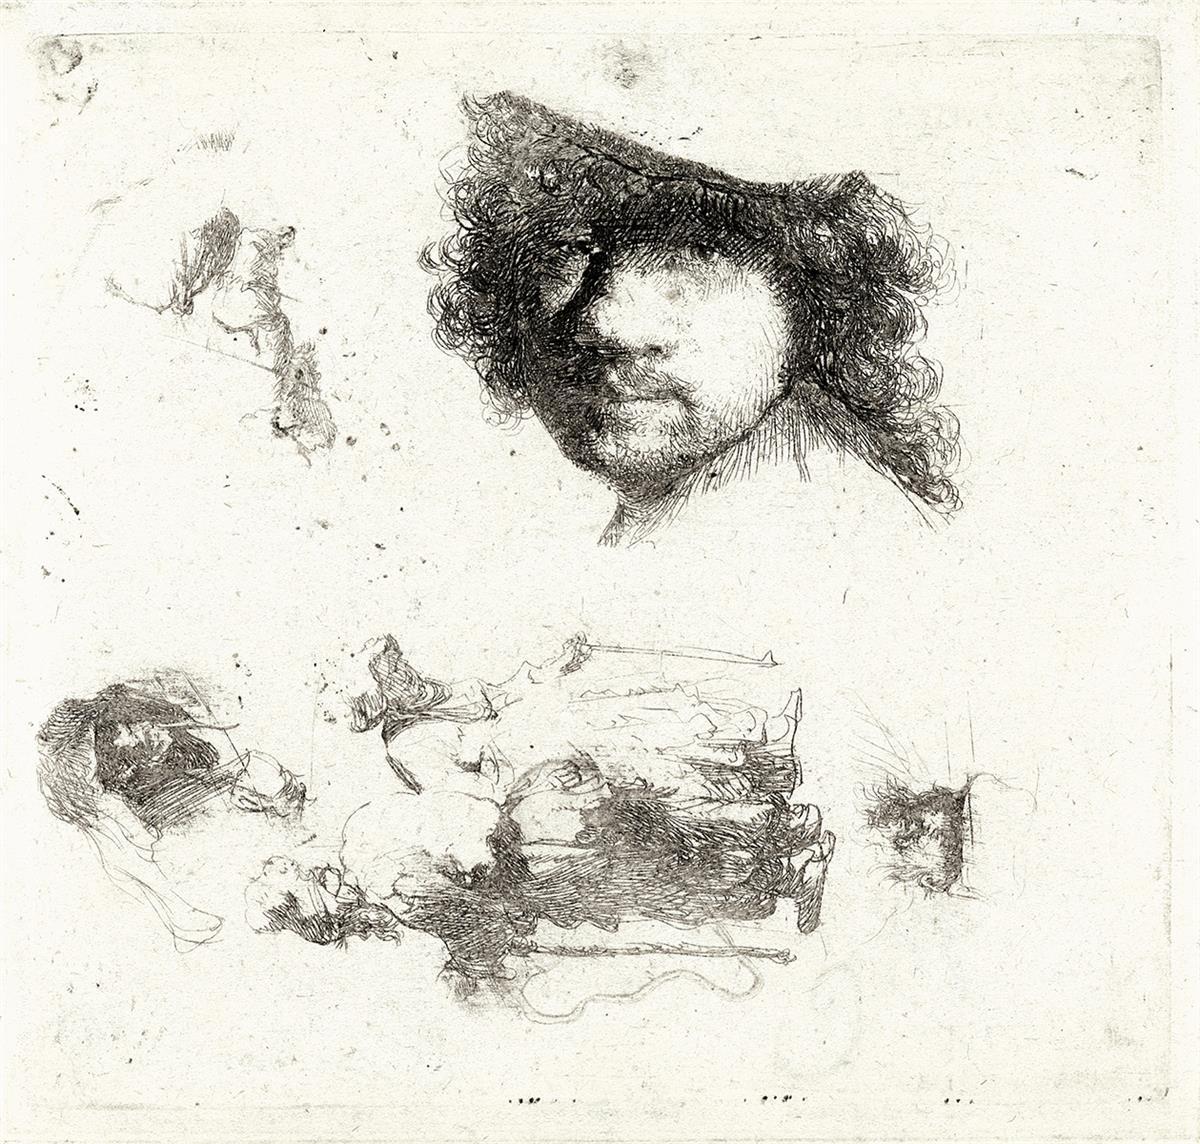 REMBRANDT-VAN-RIJN-Sheet-of-Studies-Head-of-the-Artist-A-Beg